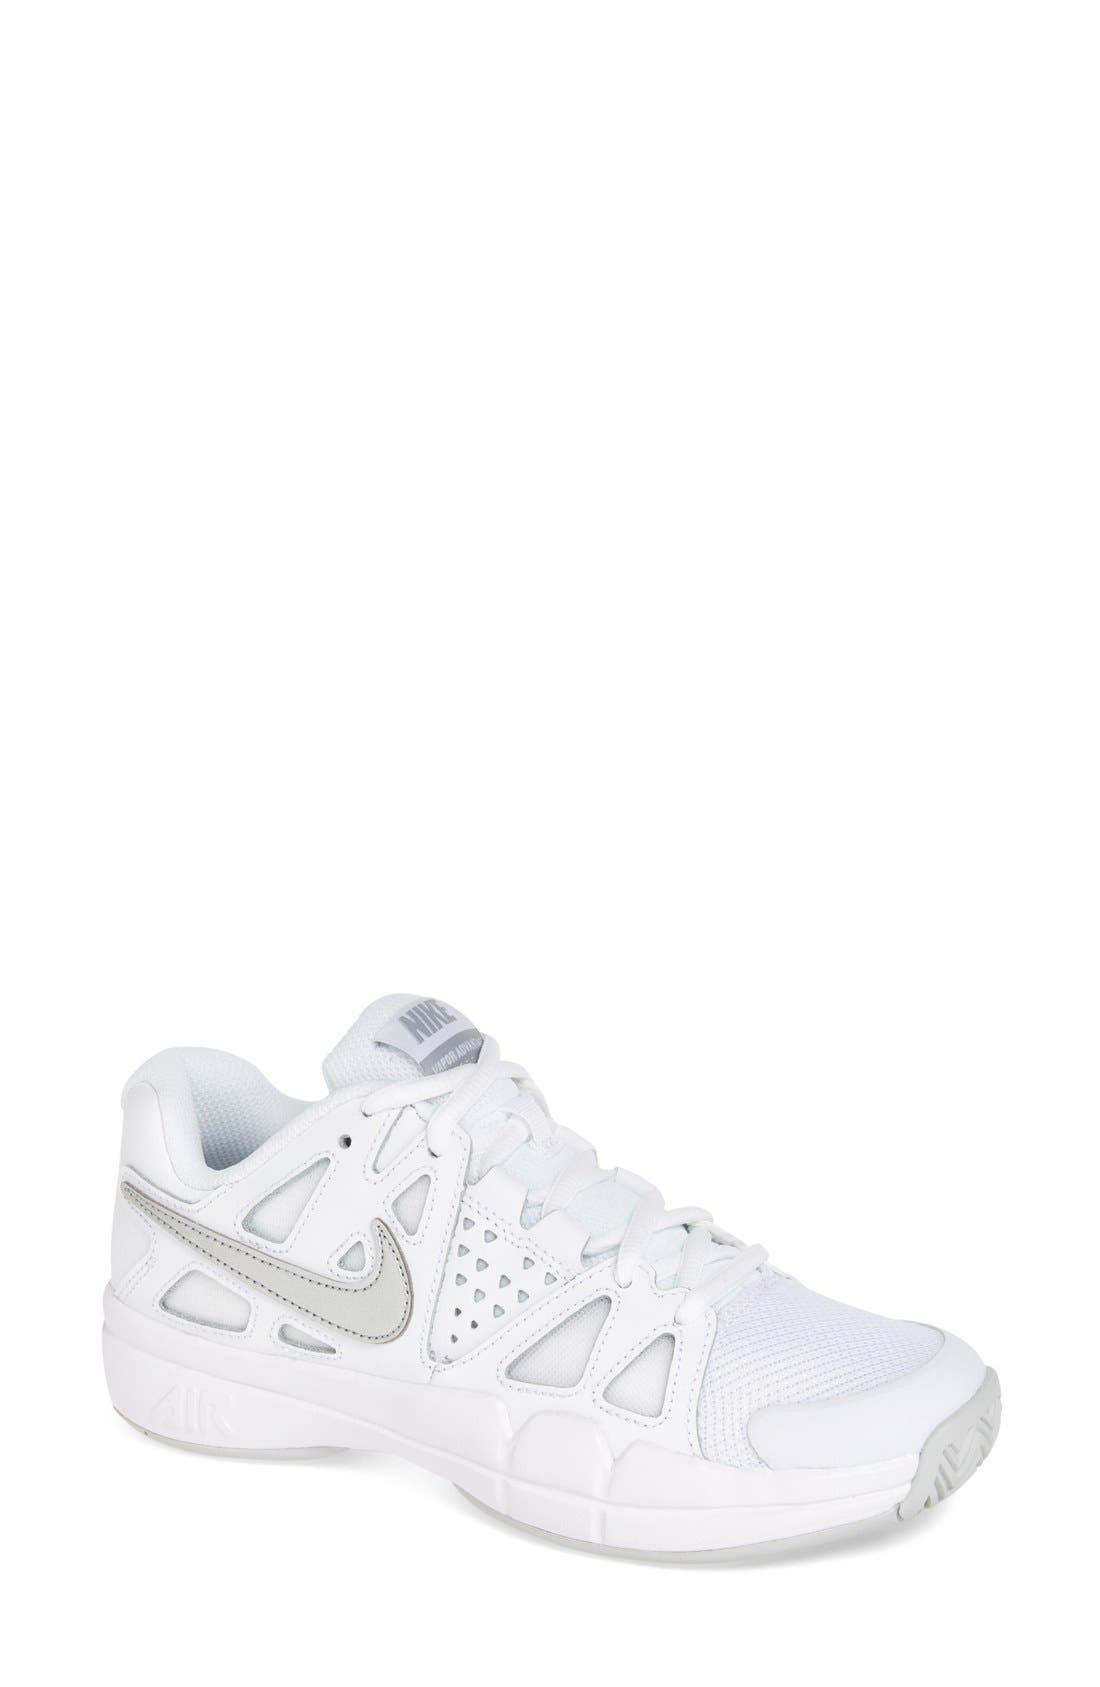 Alternate Image 1 Selected - Nike 'Air Vapor Advantage' Tennis Shoe (Women)